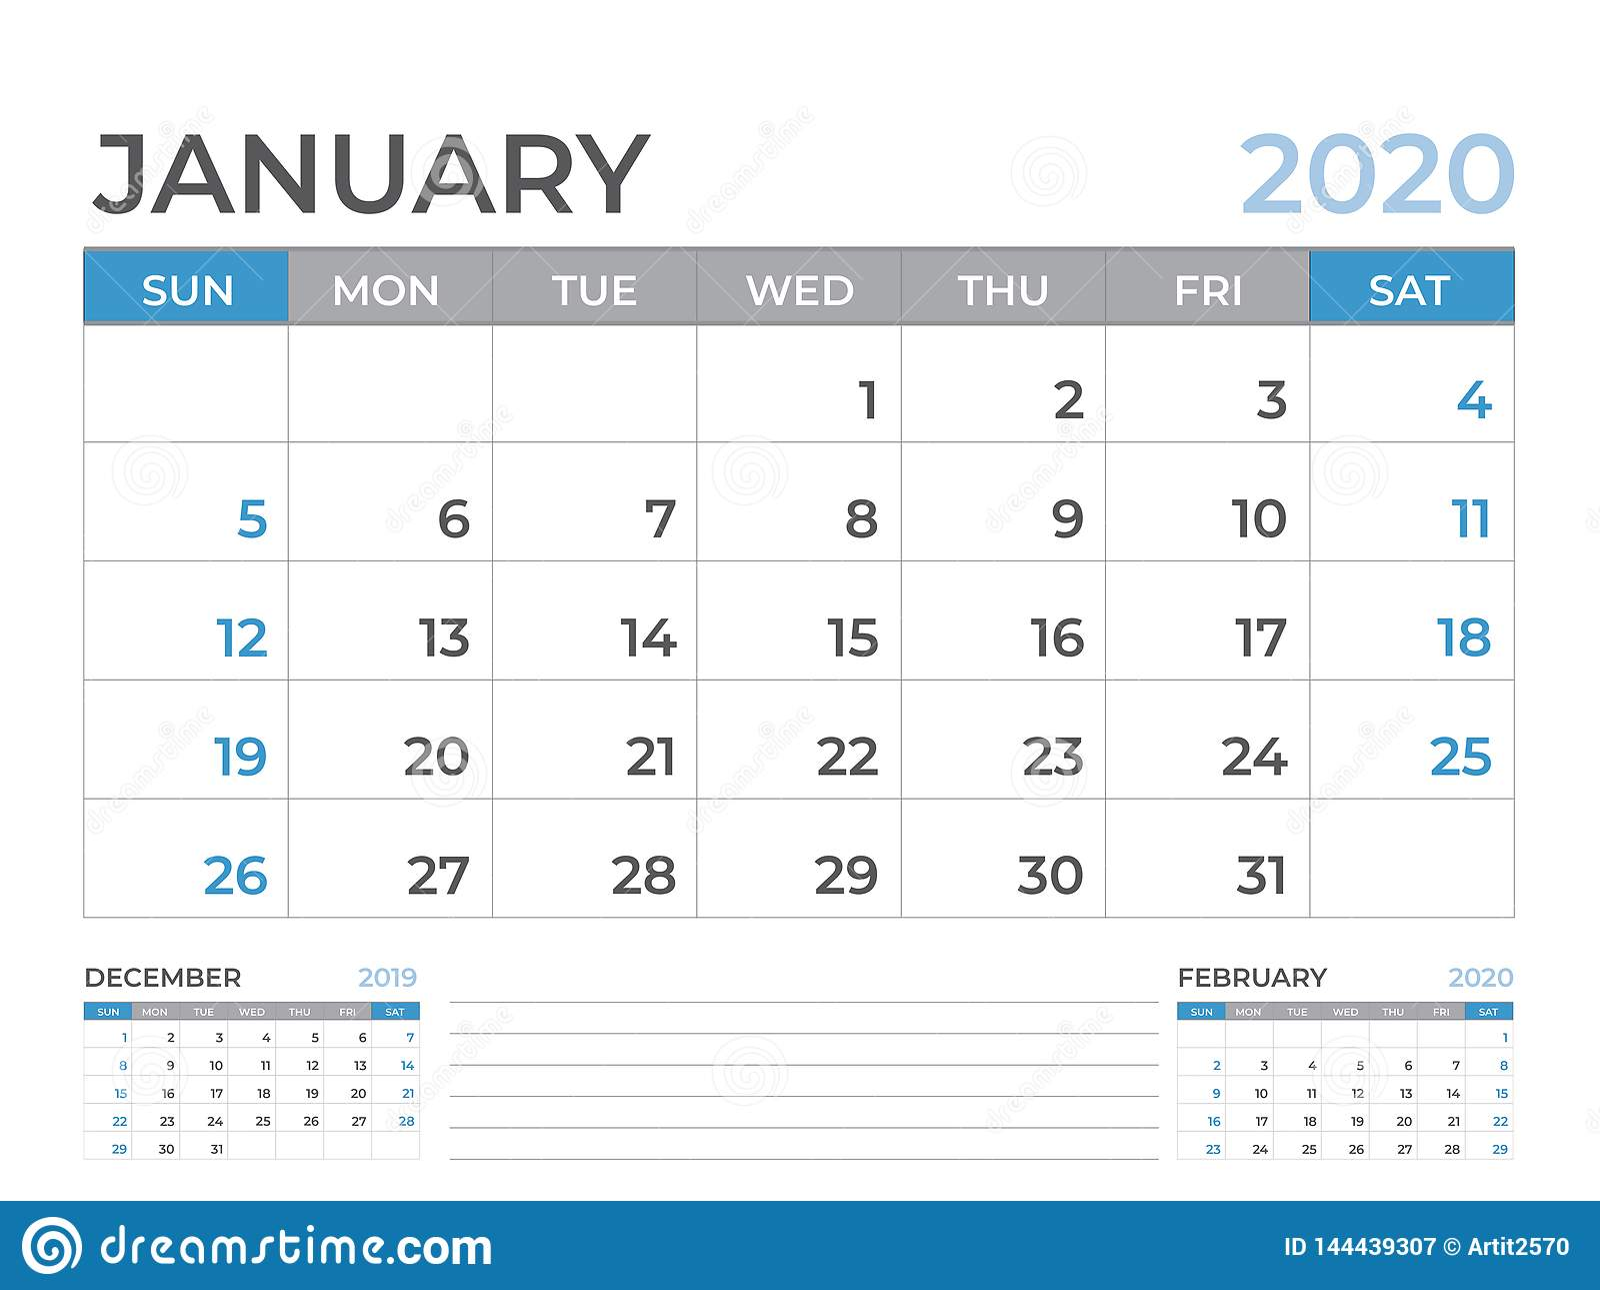 Calendar 2020 January By Week January 2020 Calendar Template, Desk Calendar Layout Size 8 X 6